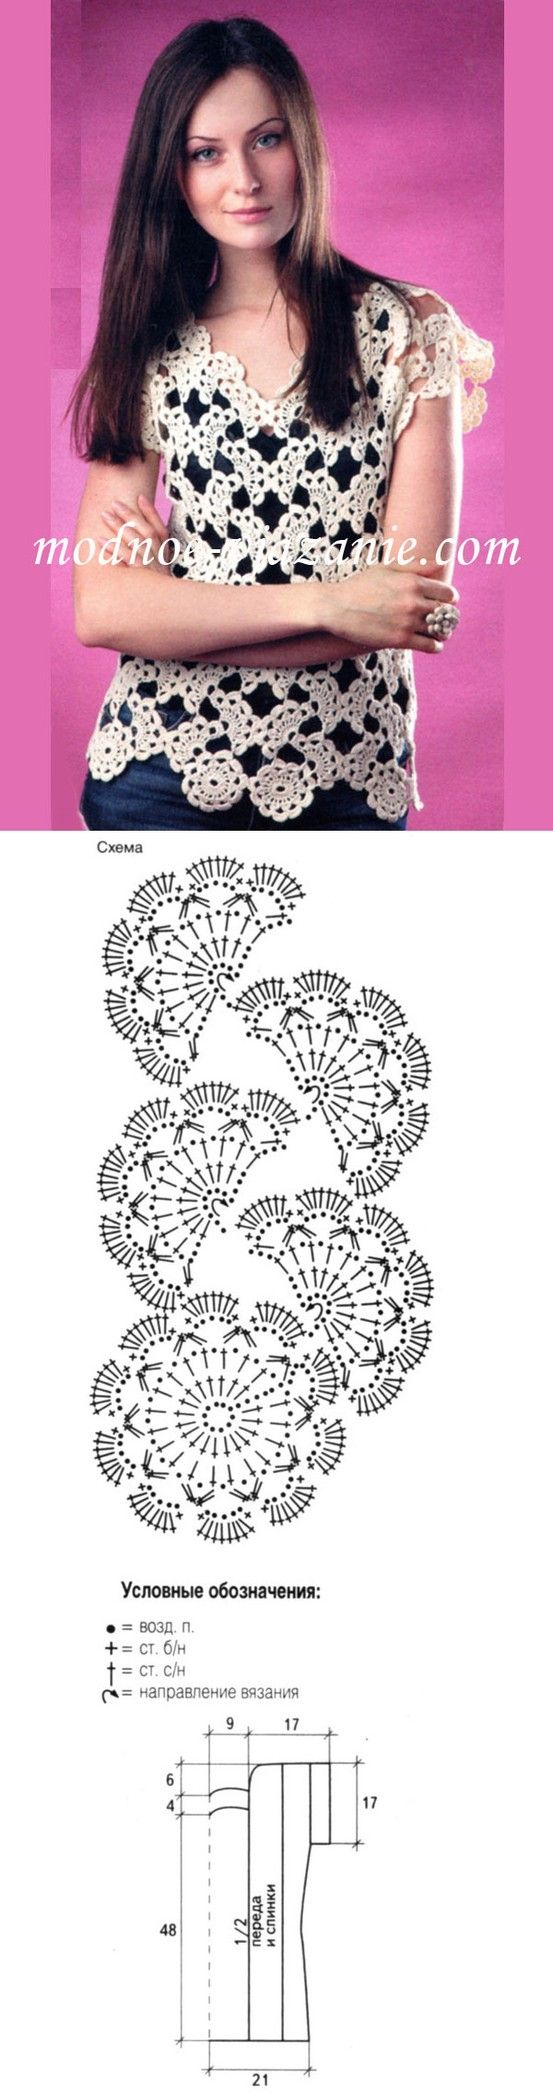 con tiras de encaje http://pinterest.com/gigibrazil/crochet-and-knitting-lovers/